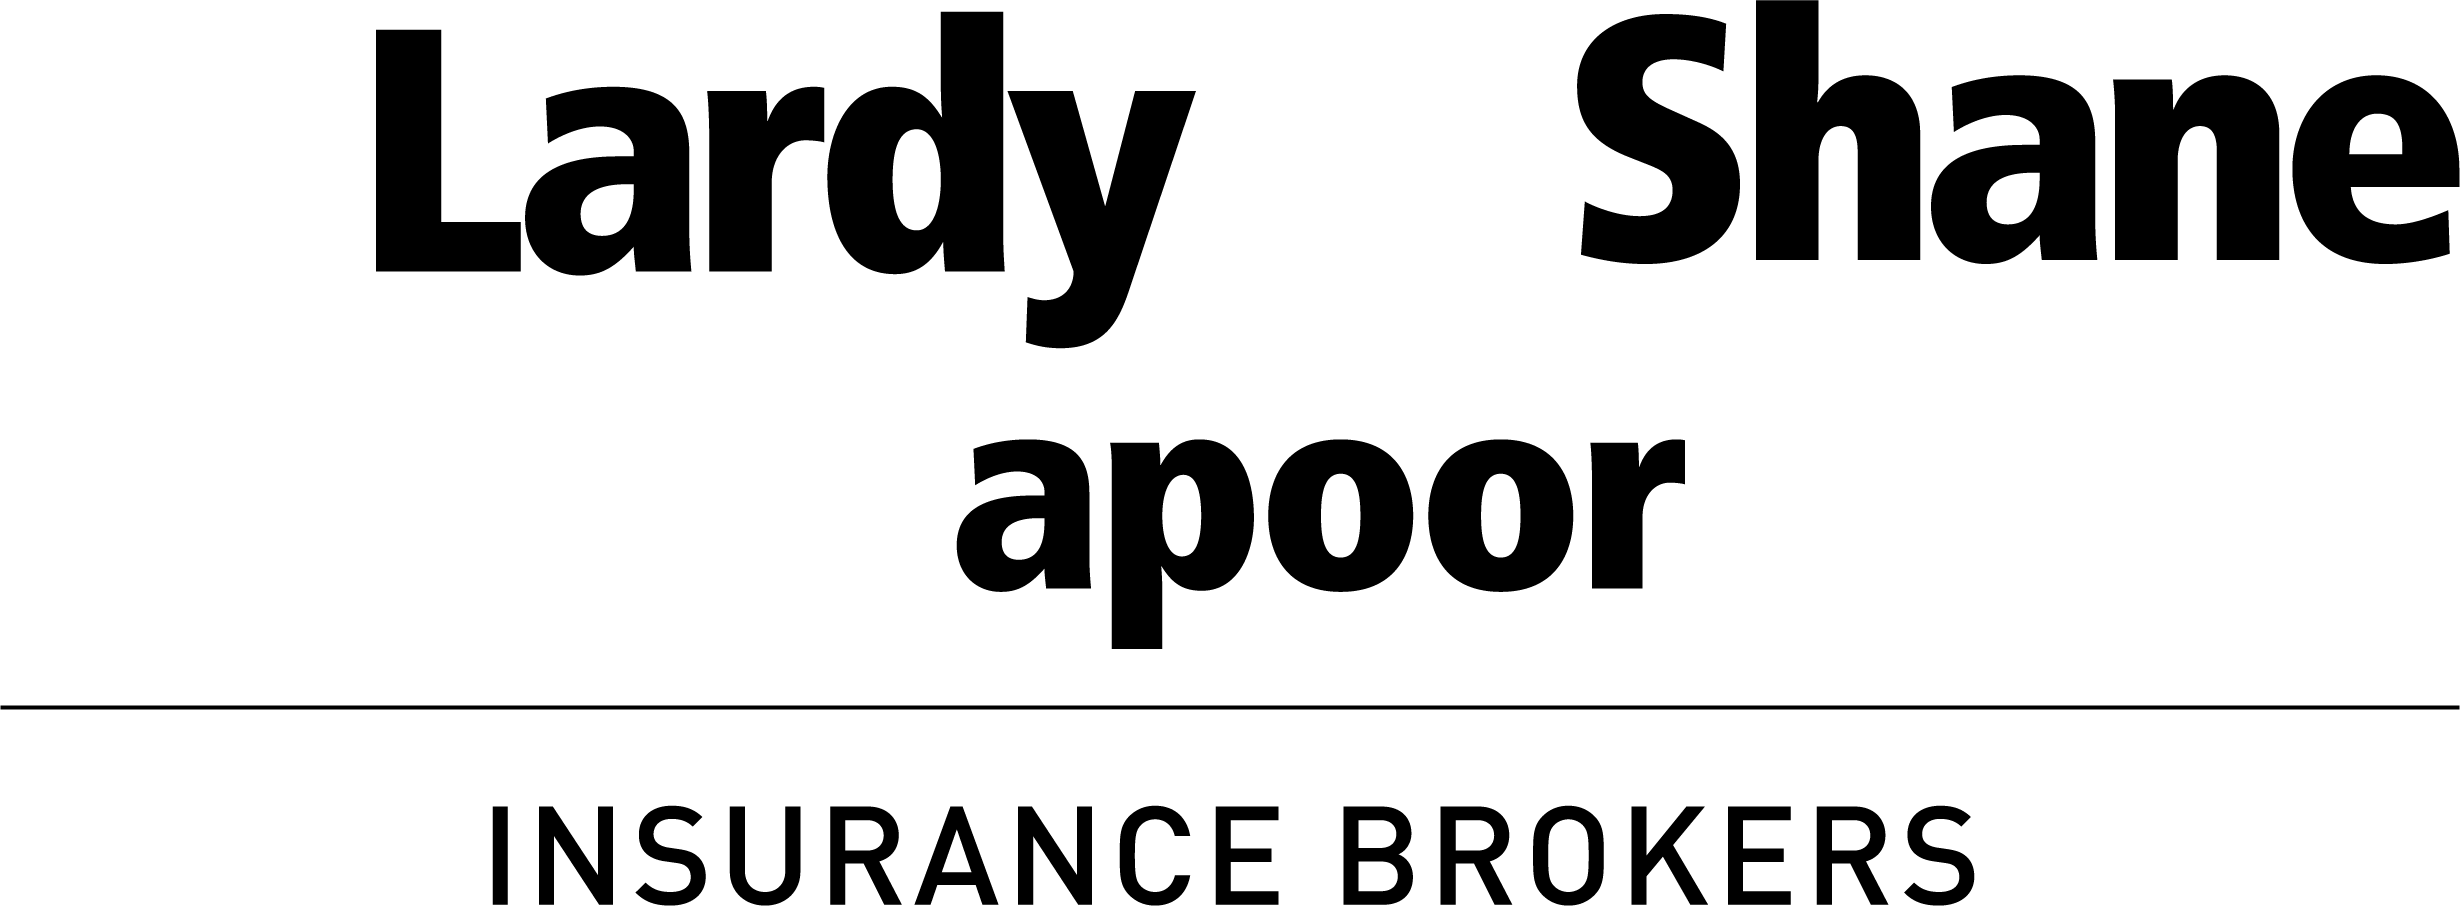 McLardy McShane Kapoor